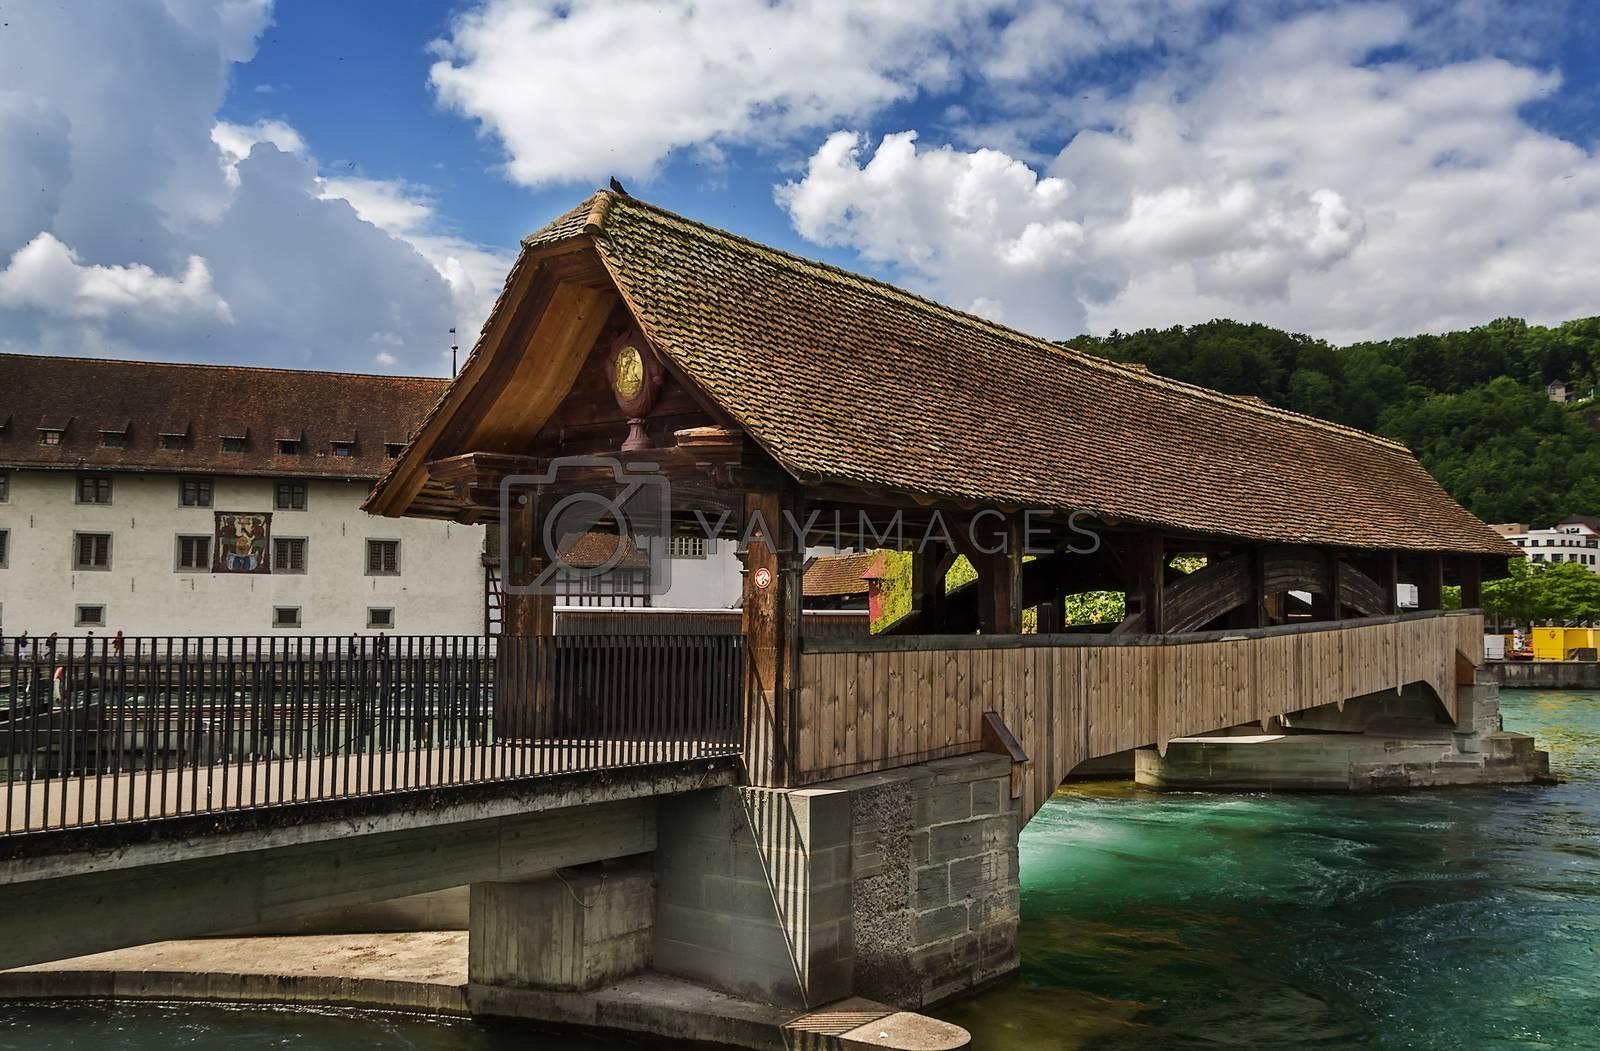 Spreuer Bridge, Lucerne by borisb17